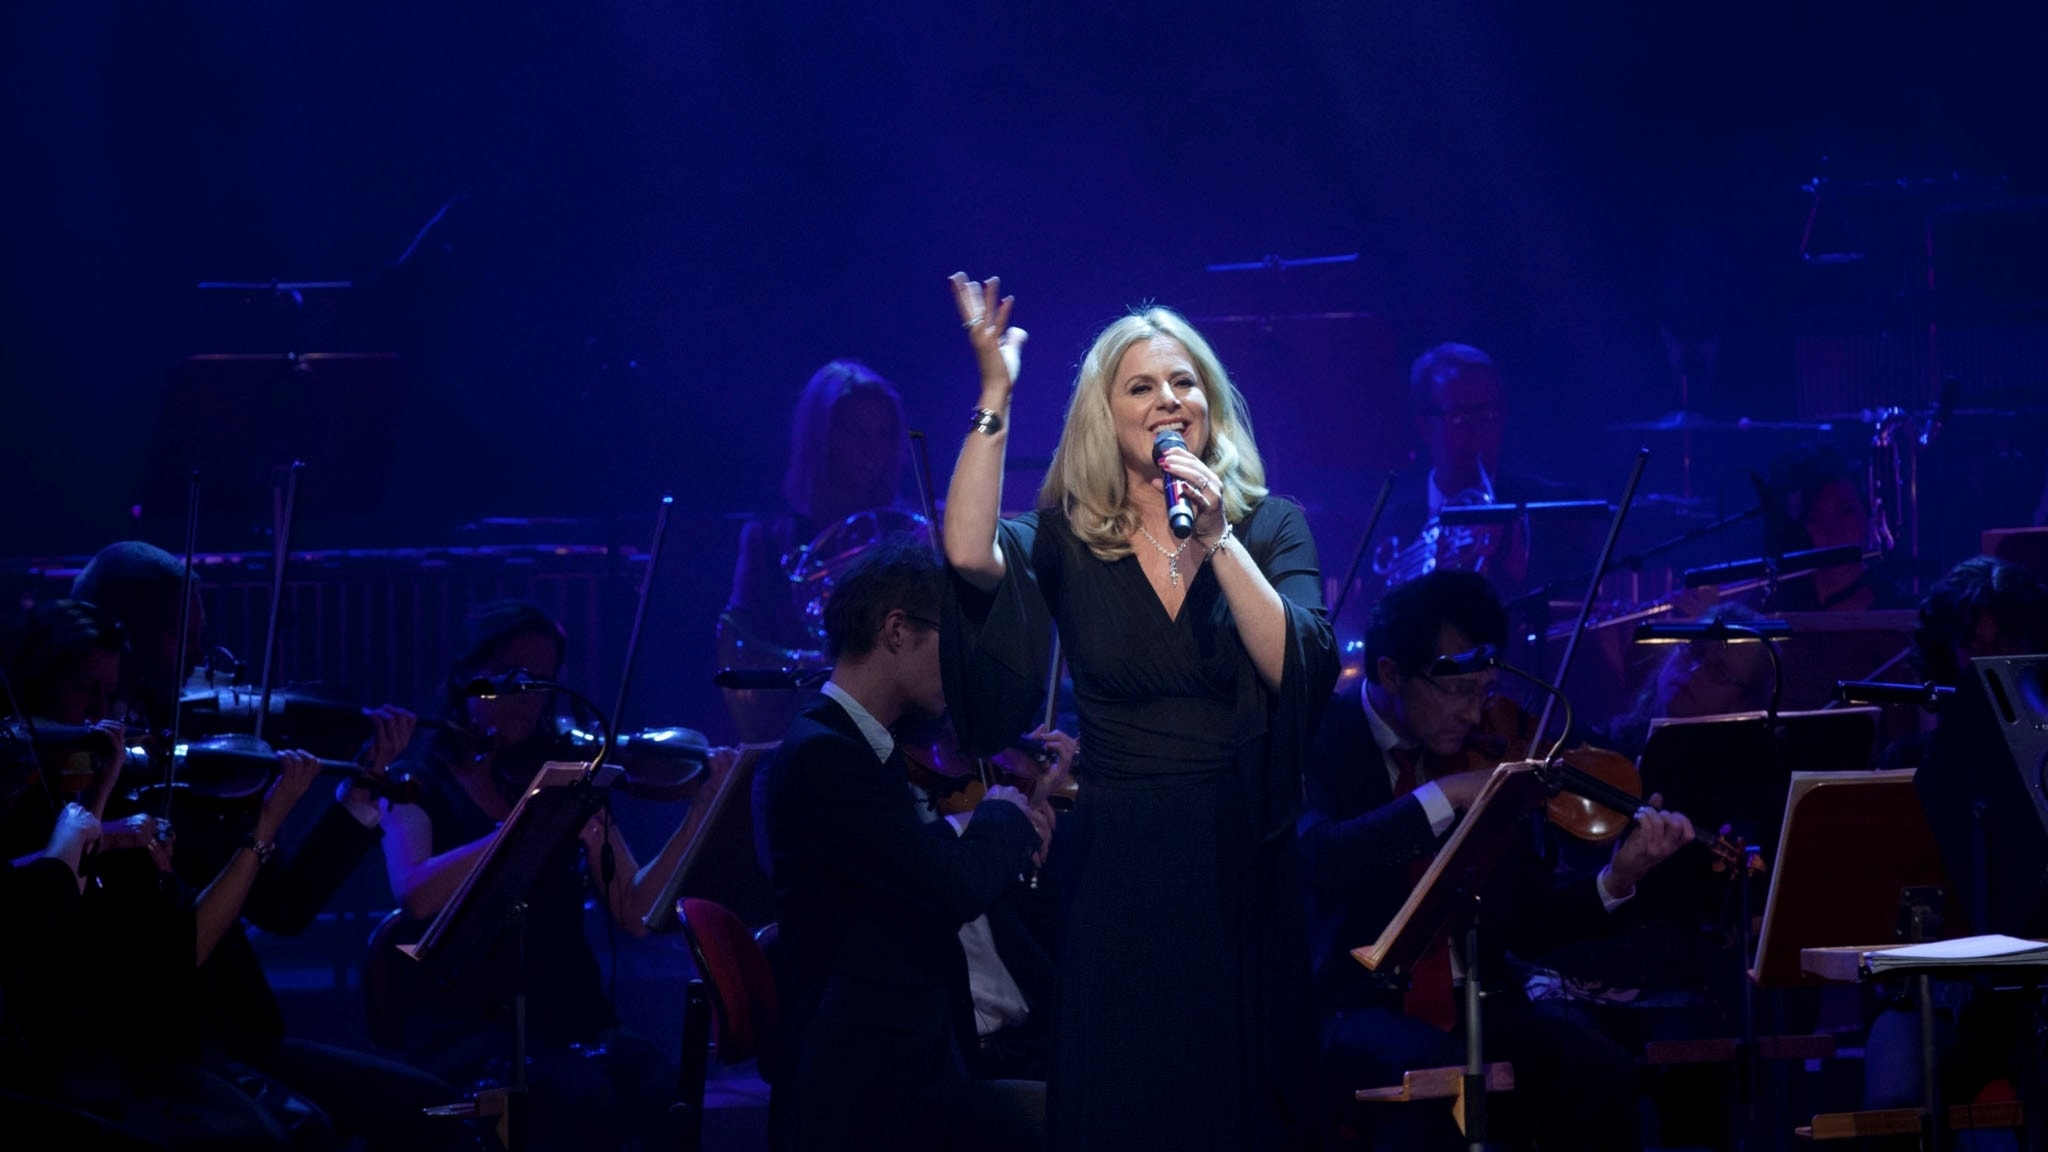 P4 Live En hyllning till Barbra Streisand